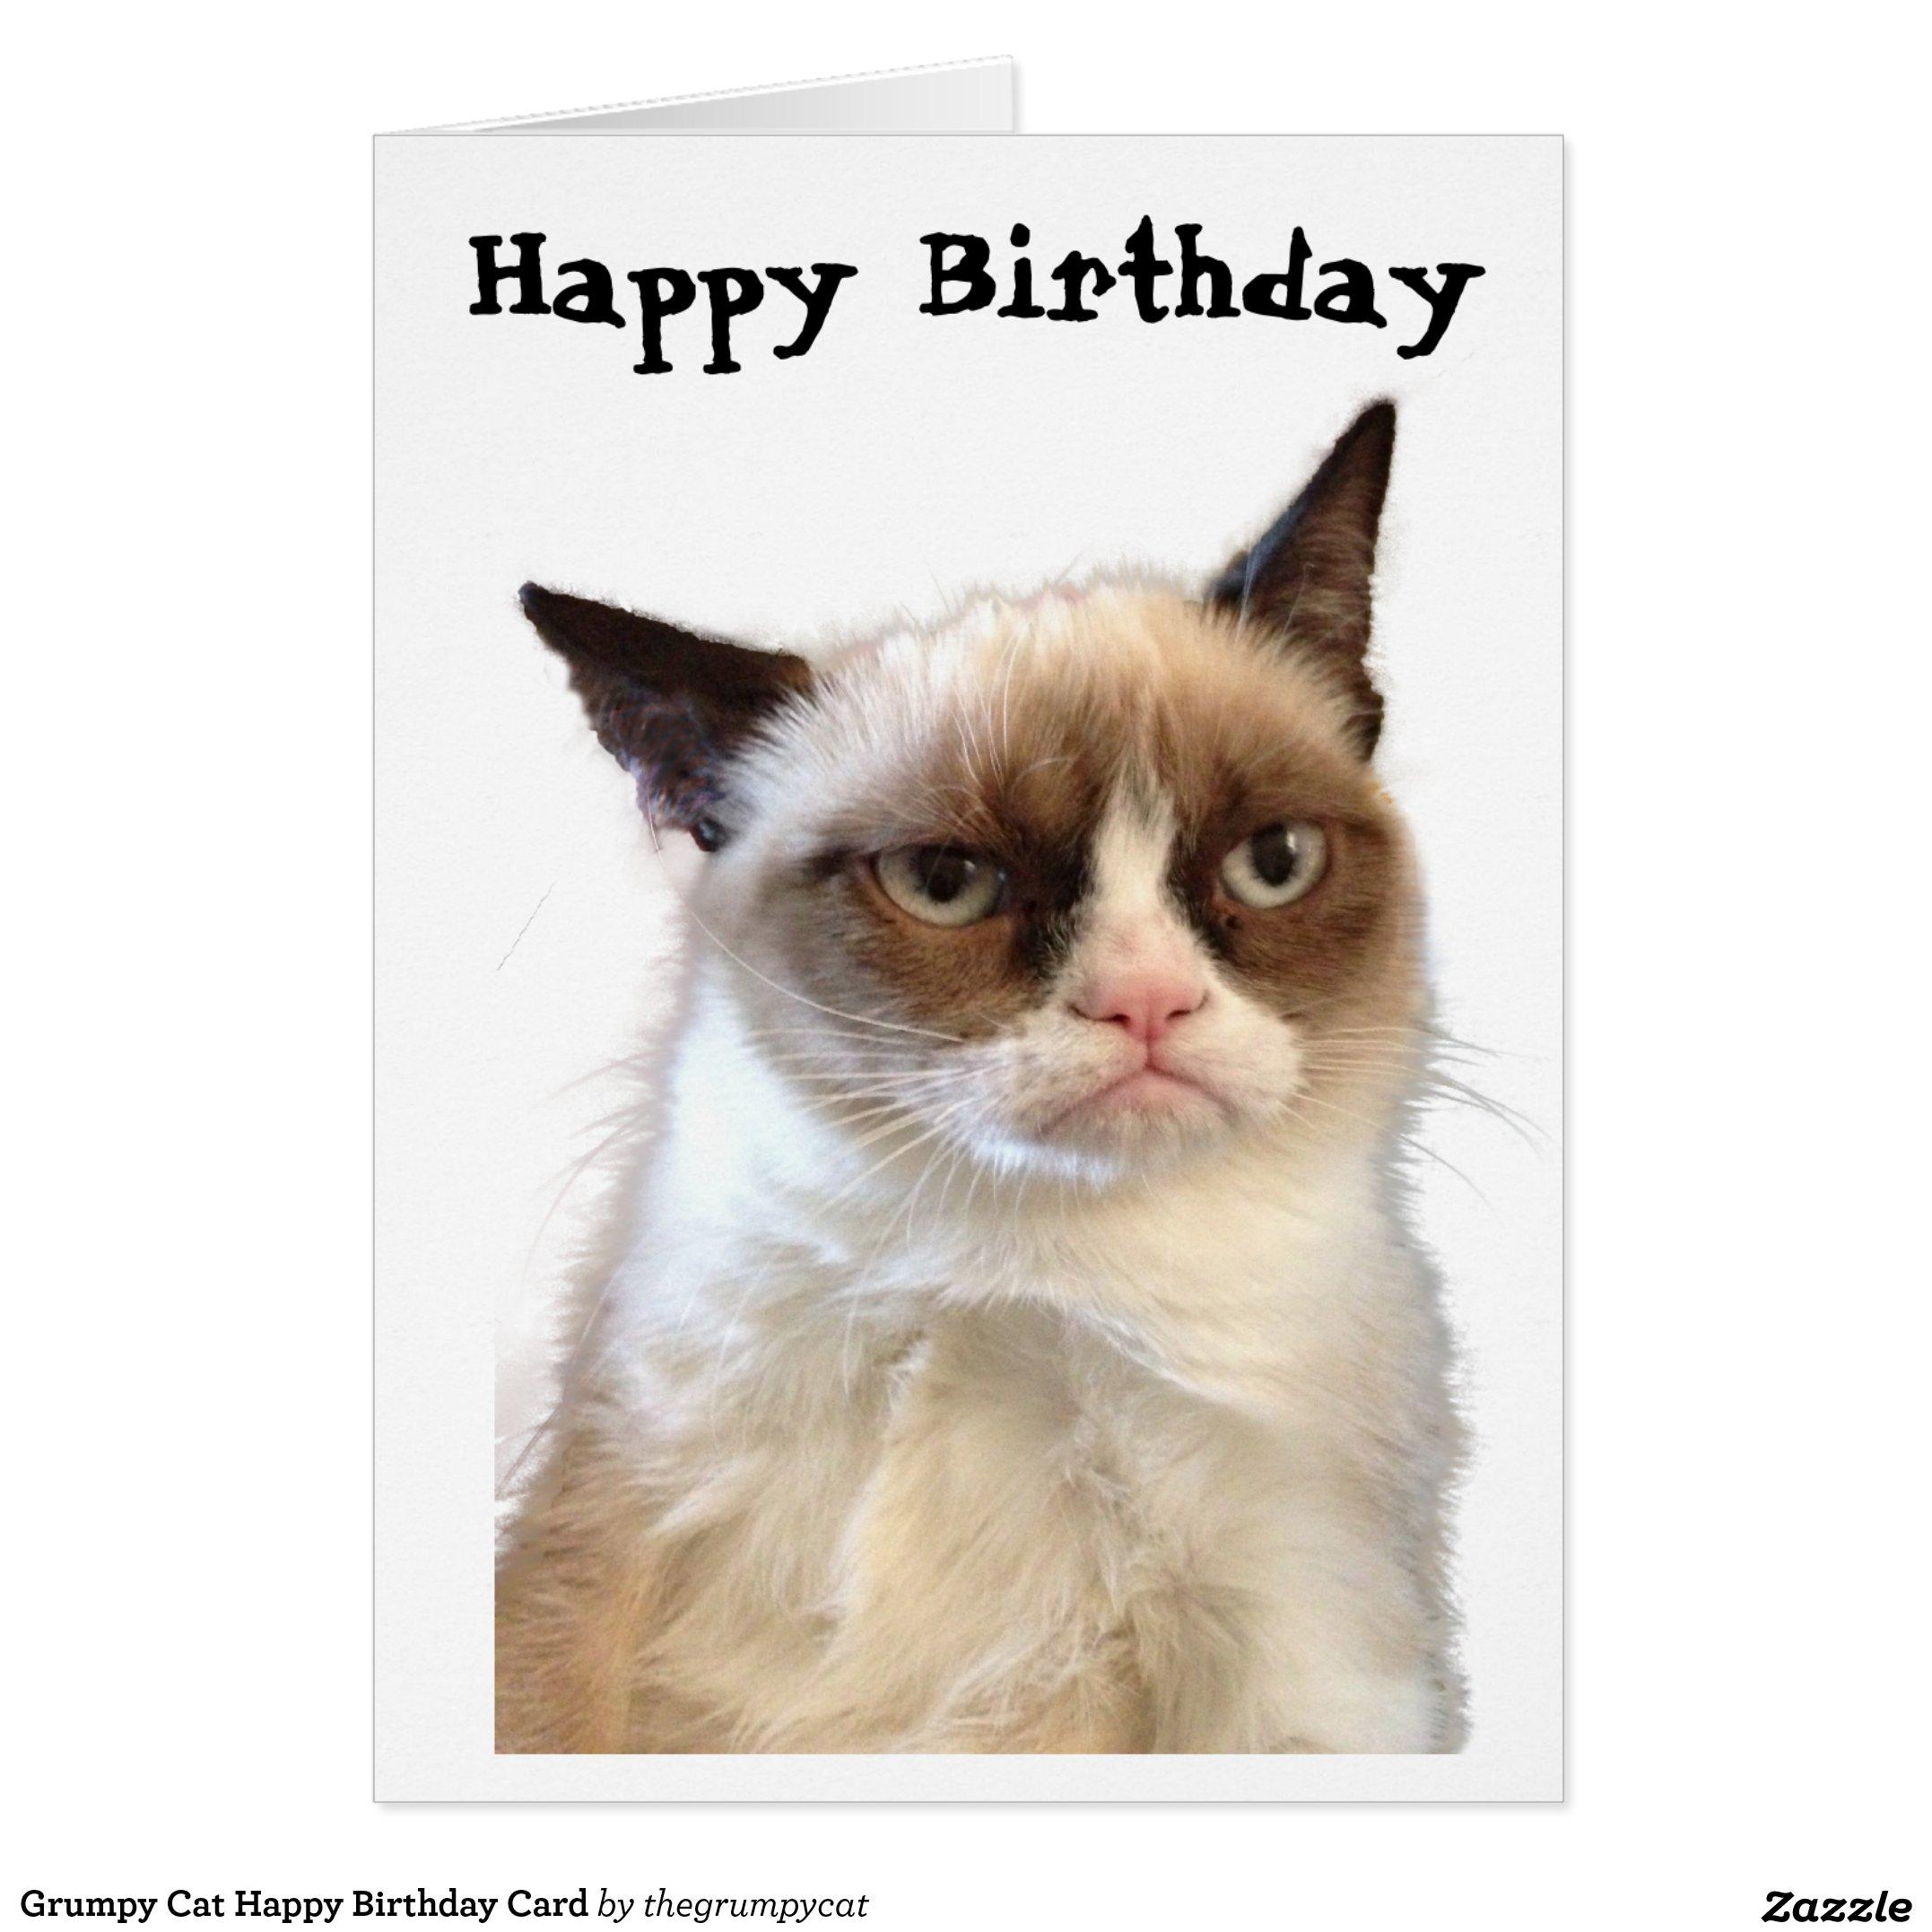 Grumpy Cat Happy Birthday Card – Birthday Cards Cats